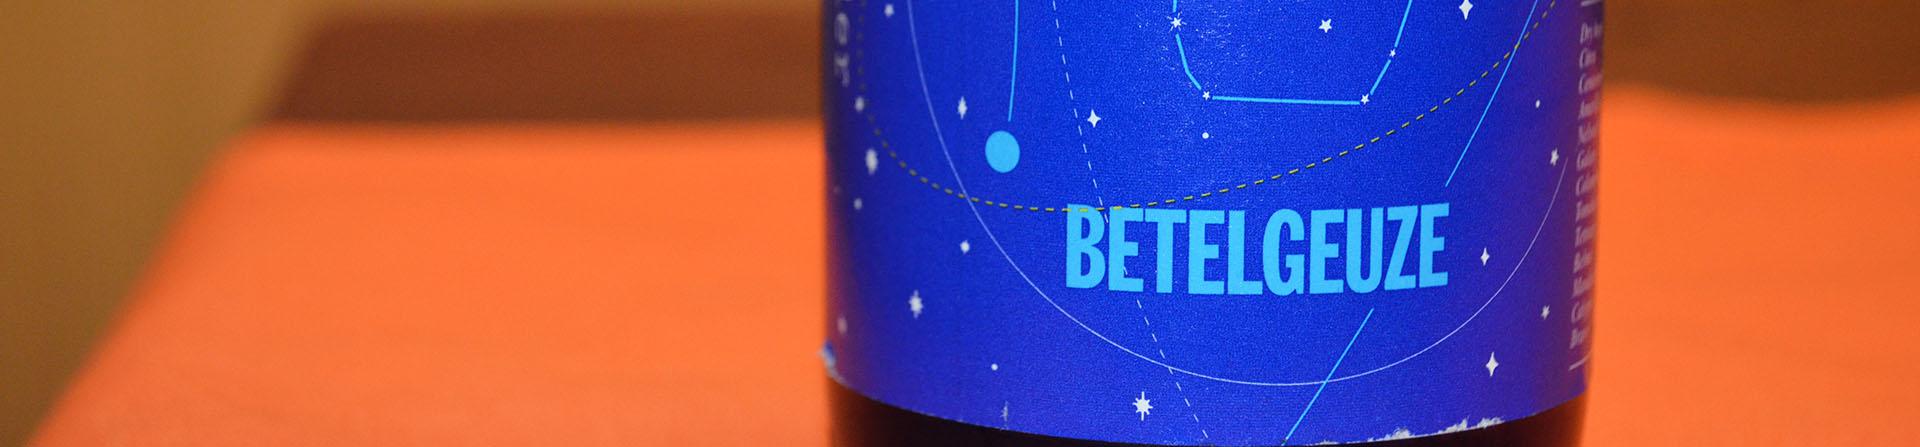 Mikkeller Betelgeuze header